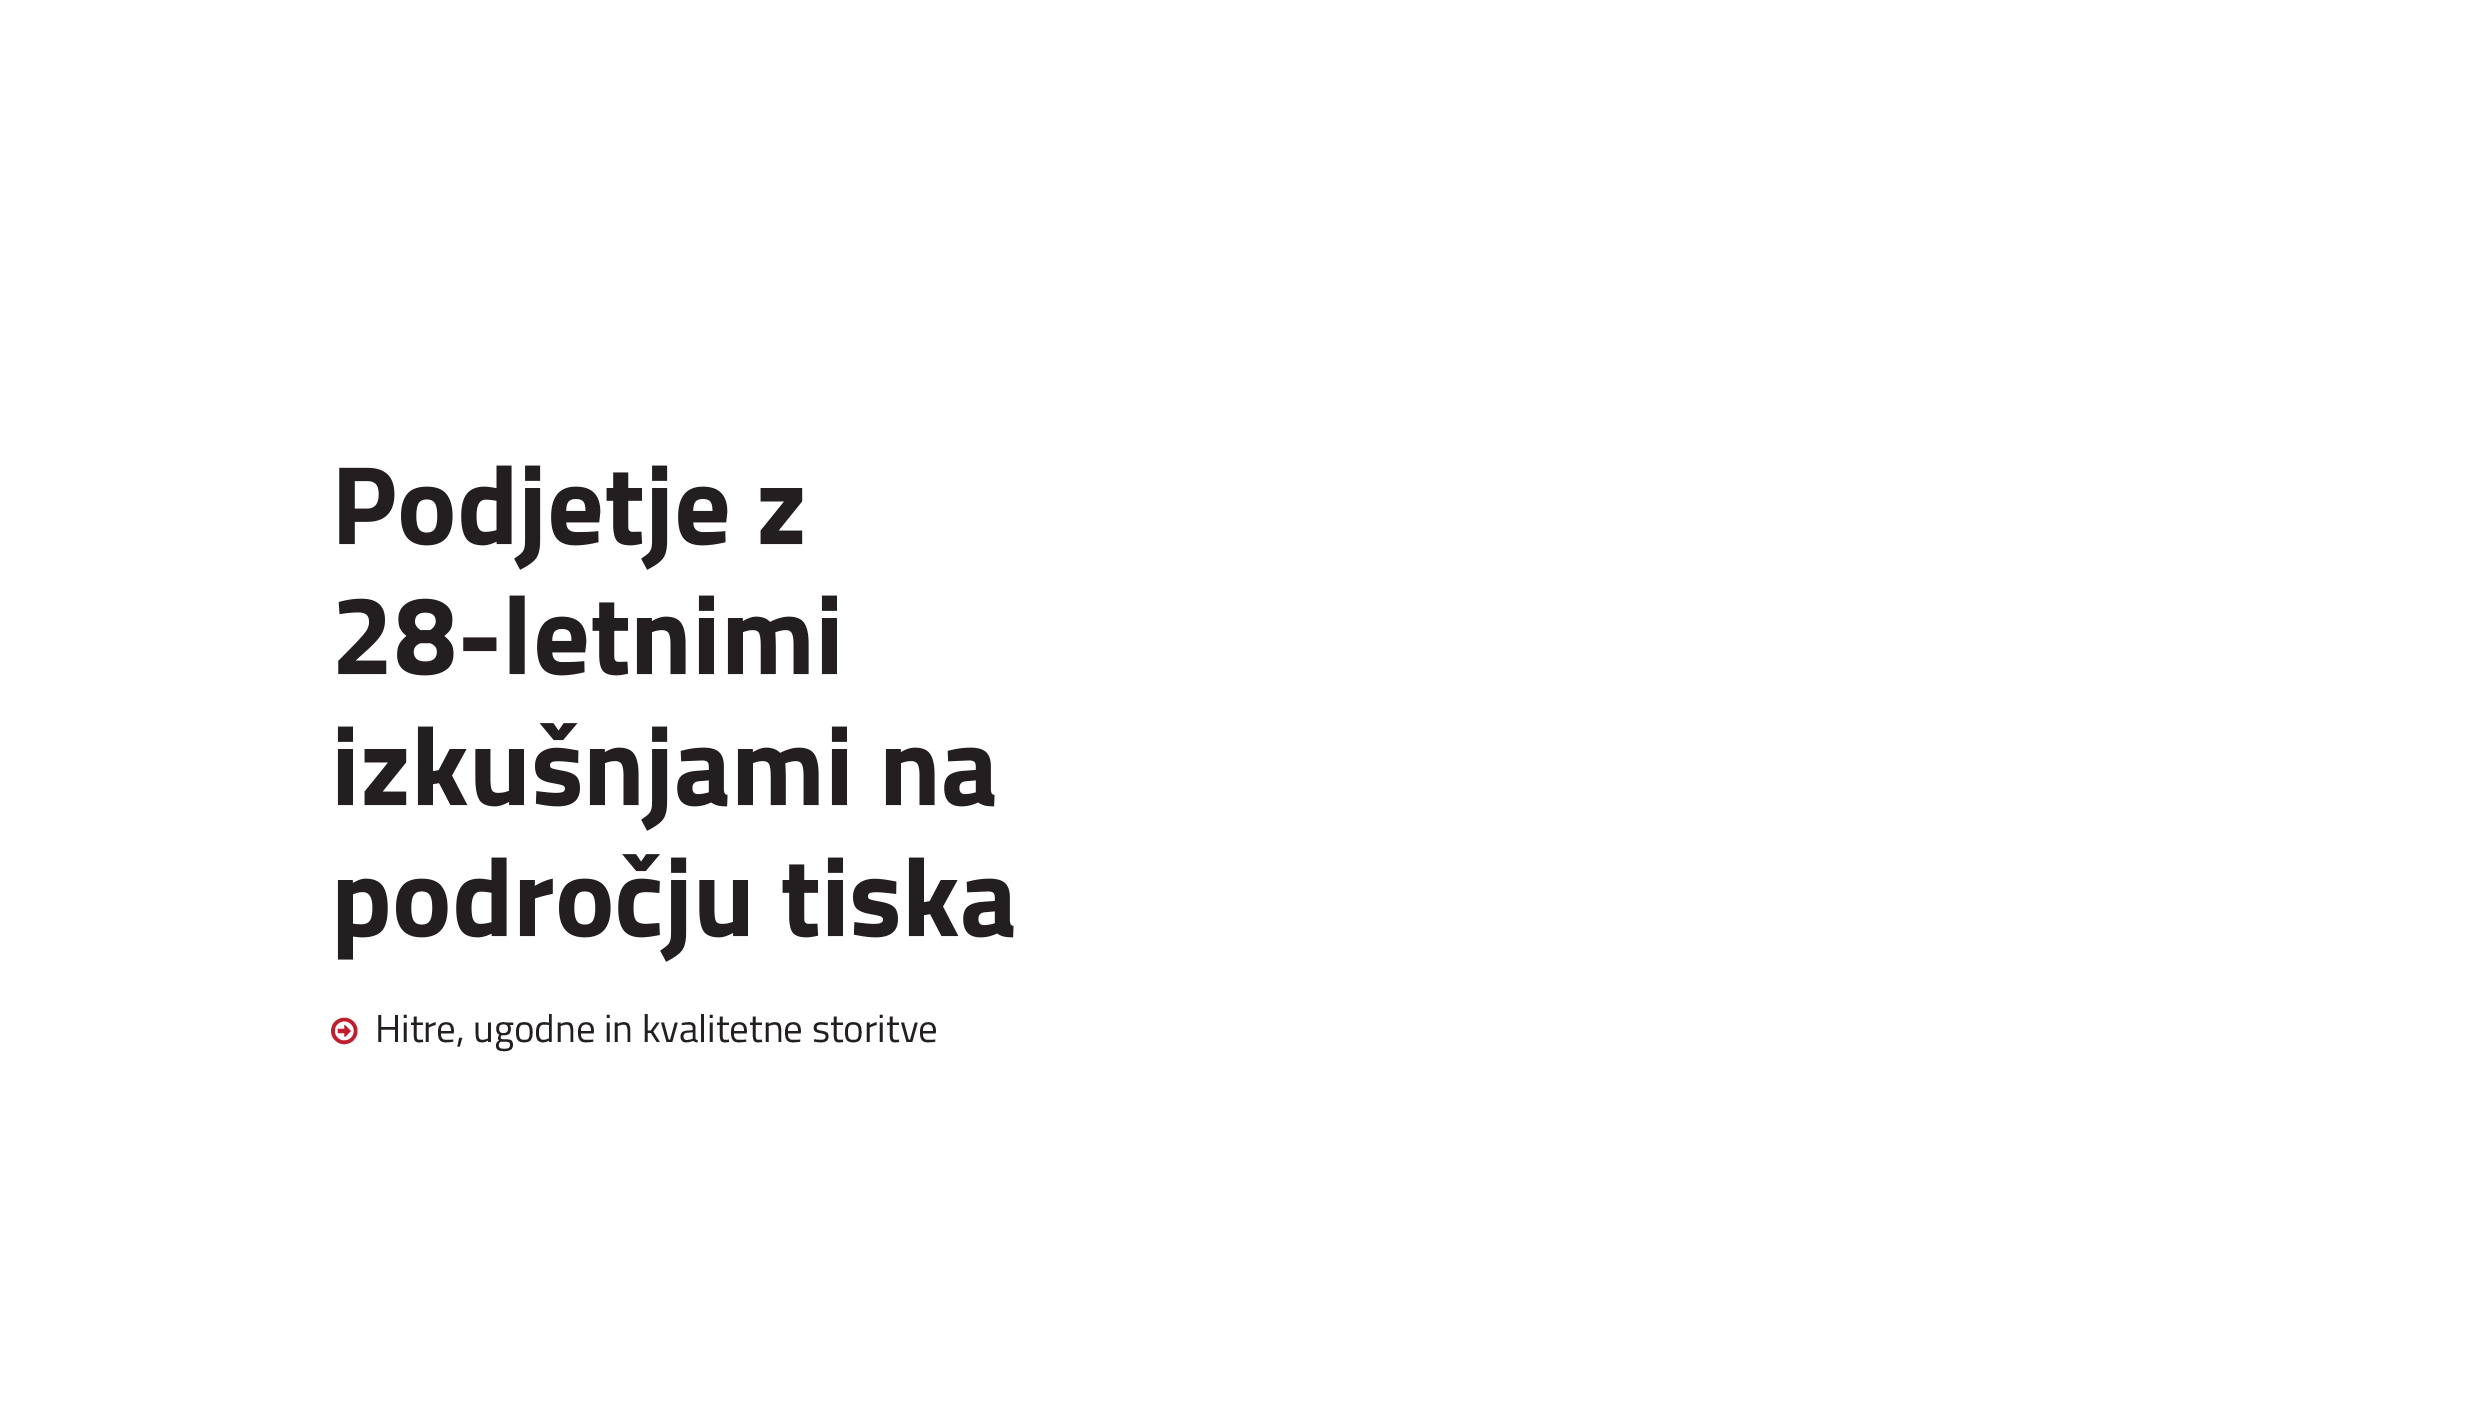 slider_podjetje_text.png